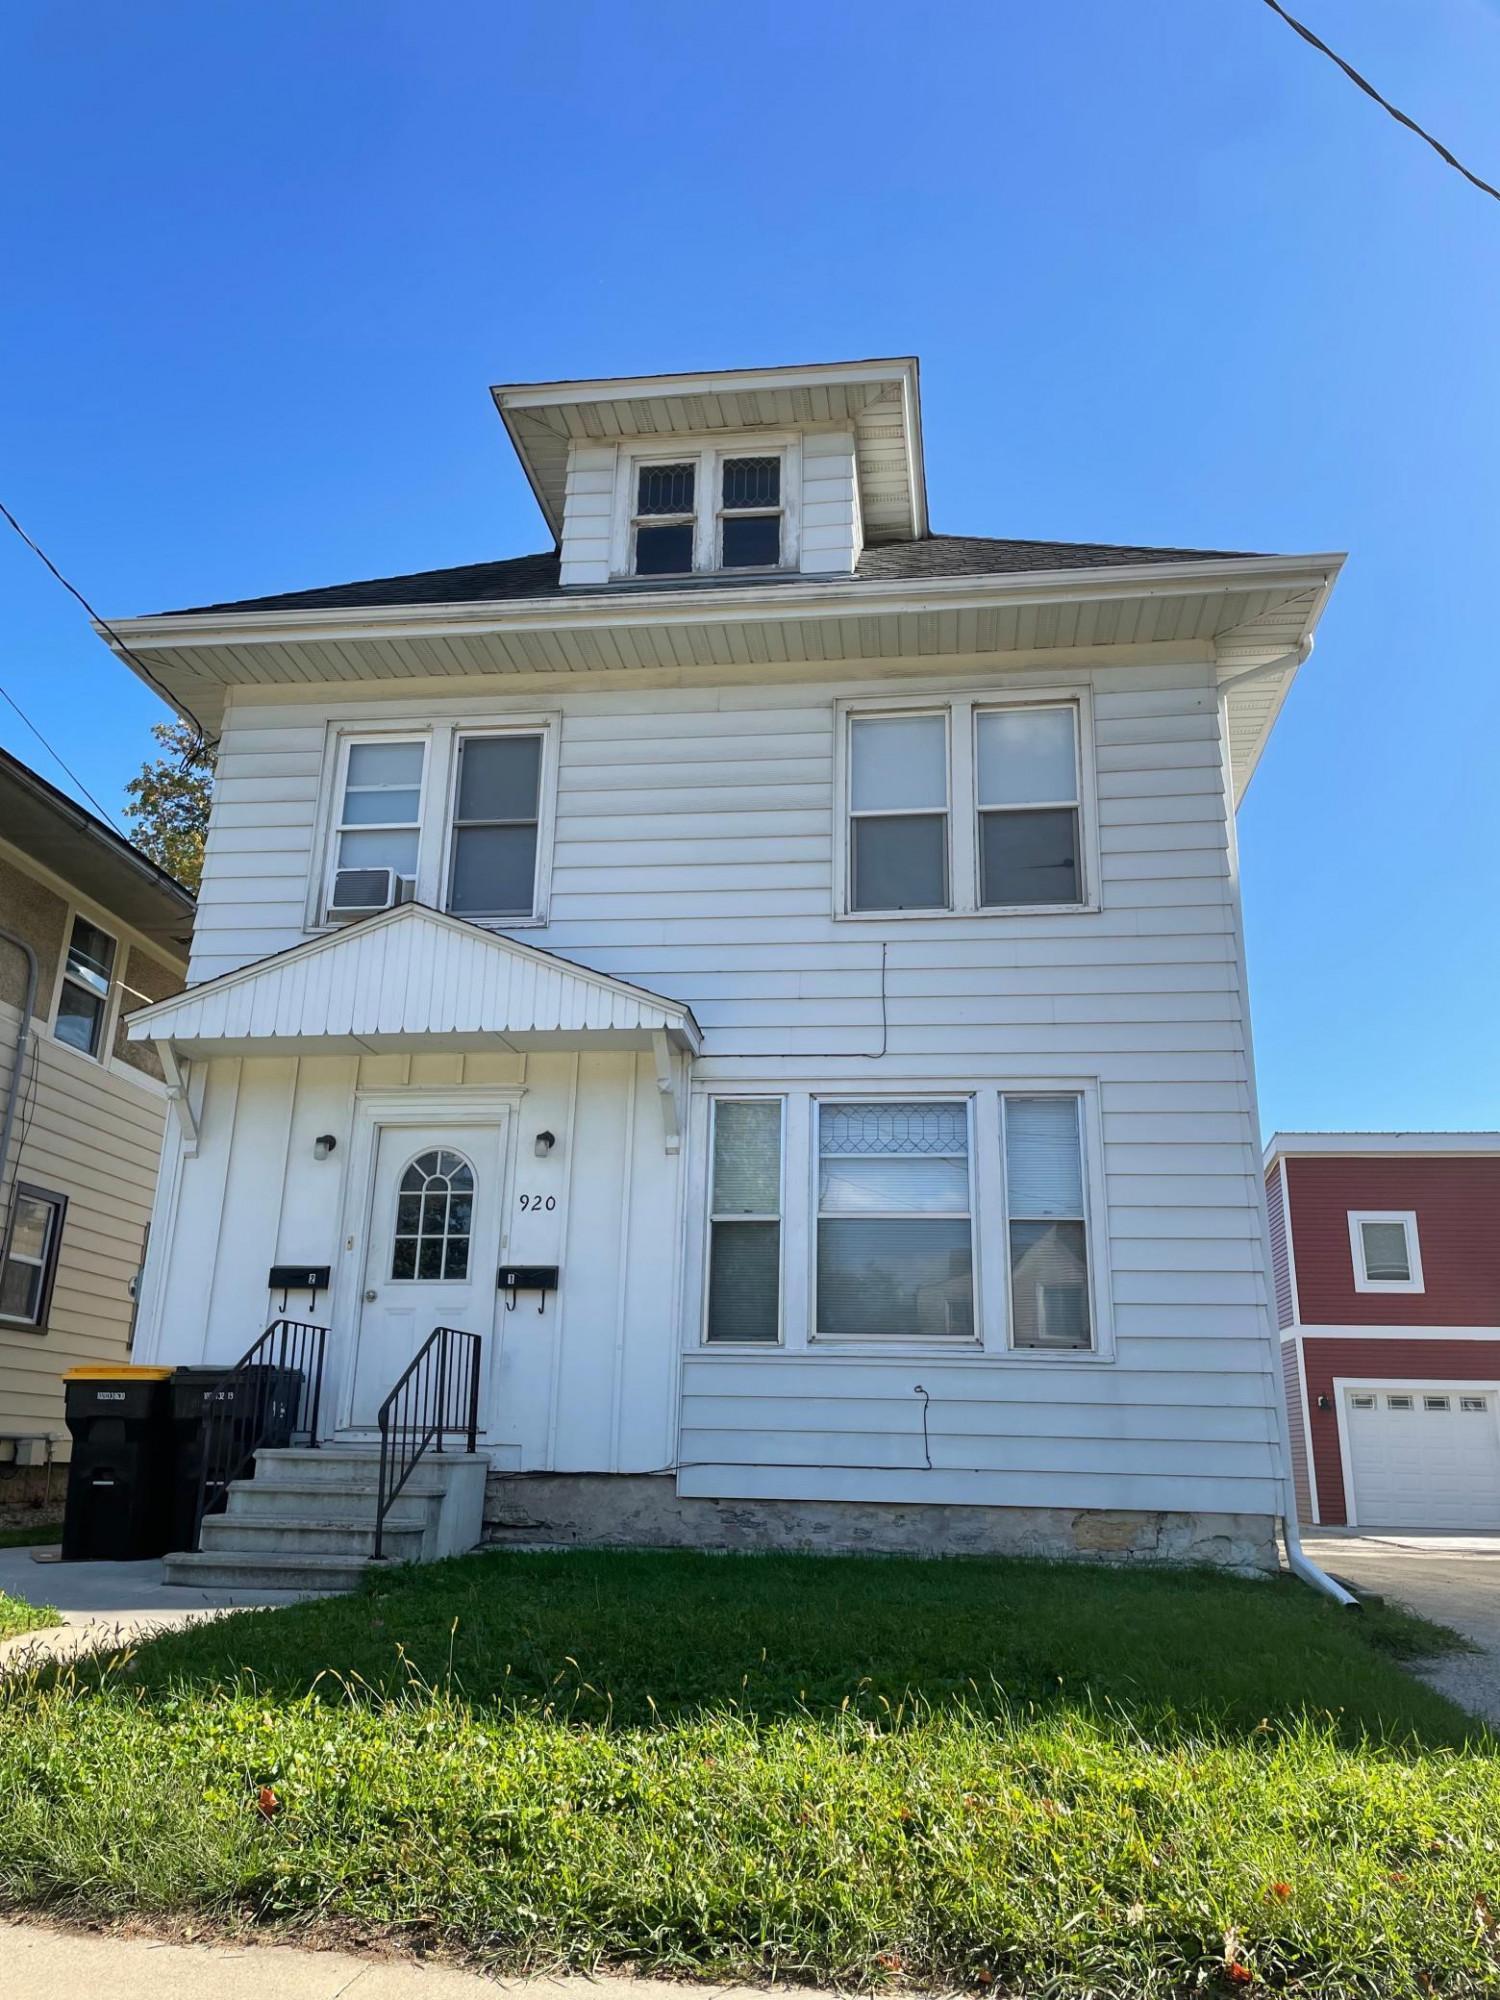 920 4th Street SE, Rochester, MN 55904